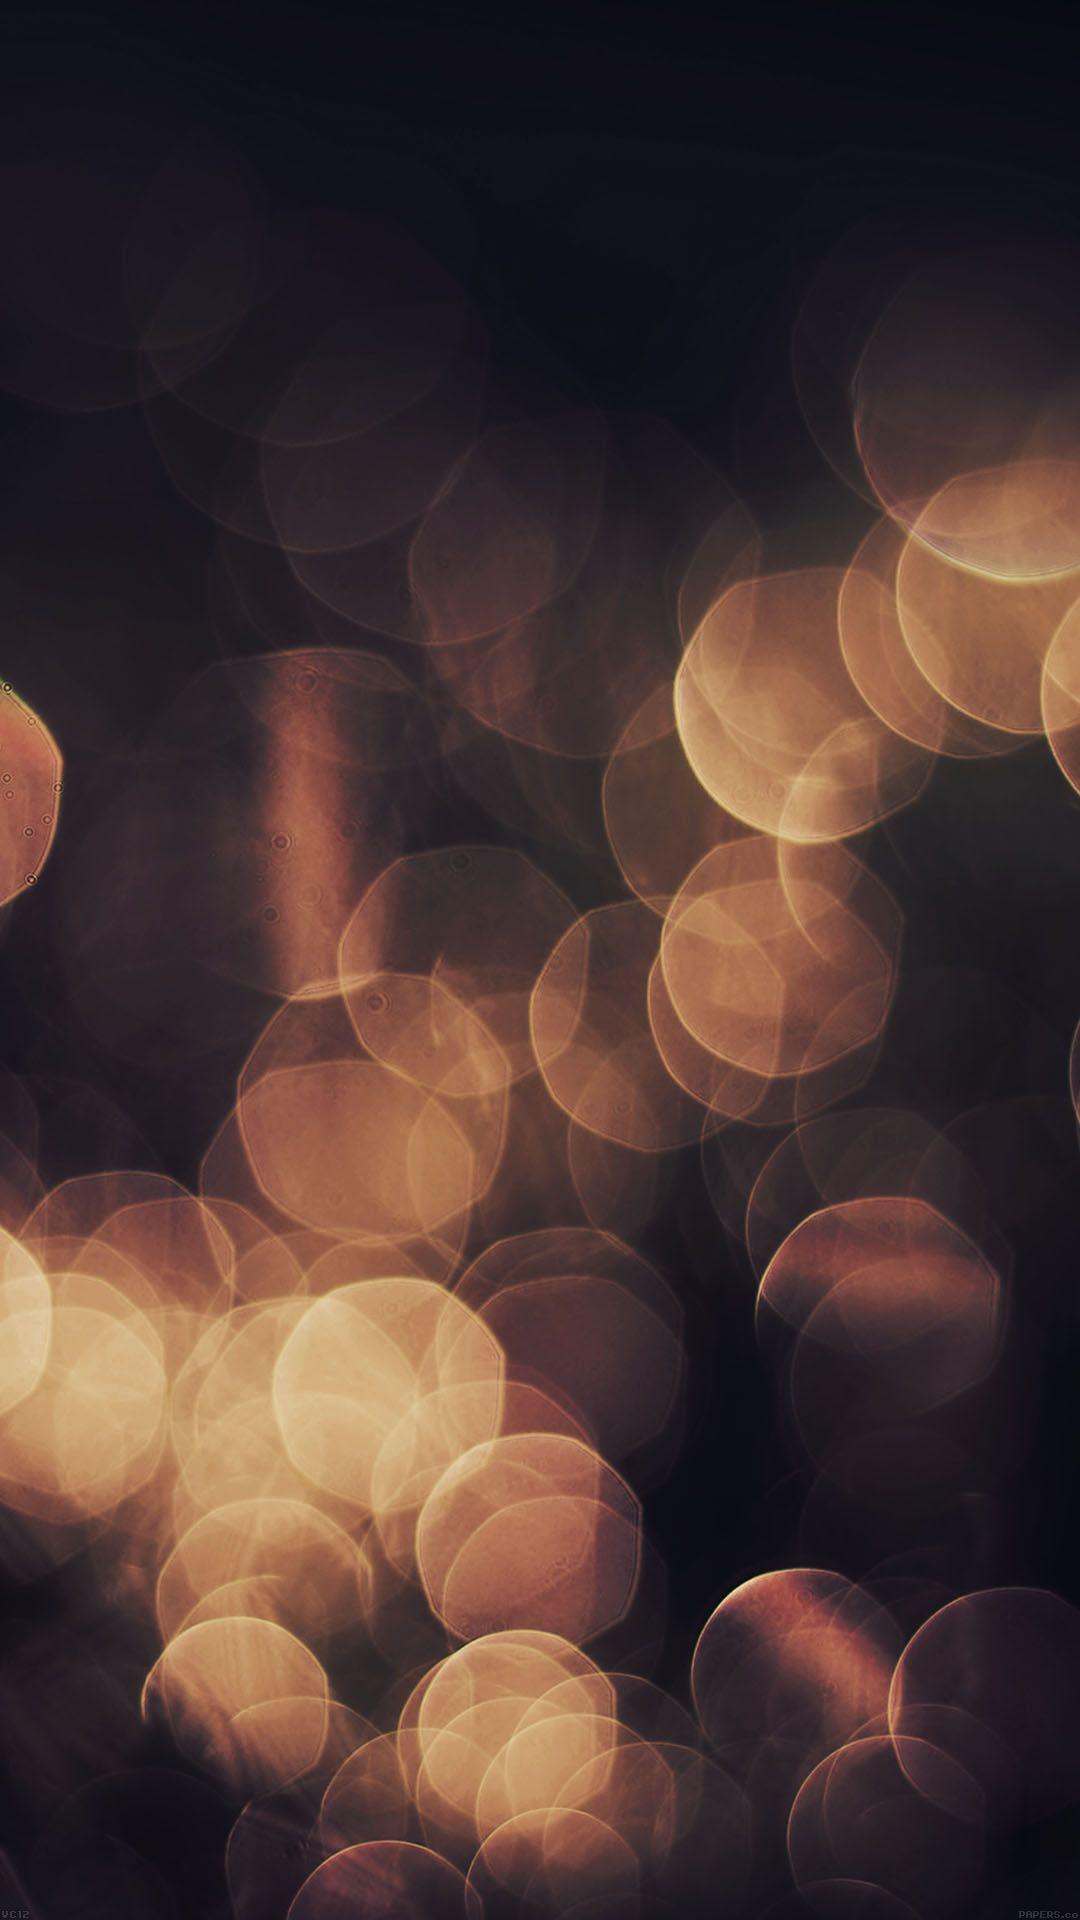 Orange Bokeh Lights Black Background Android Wallpaper Bokeh Bokeh Lights Fairy Wallpaper